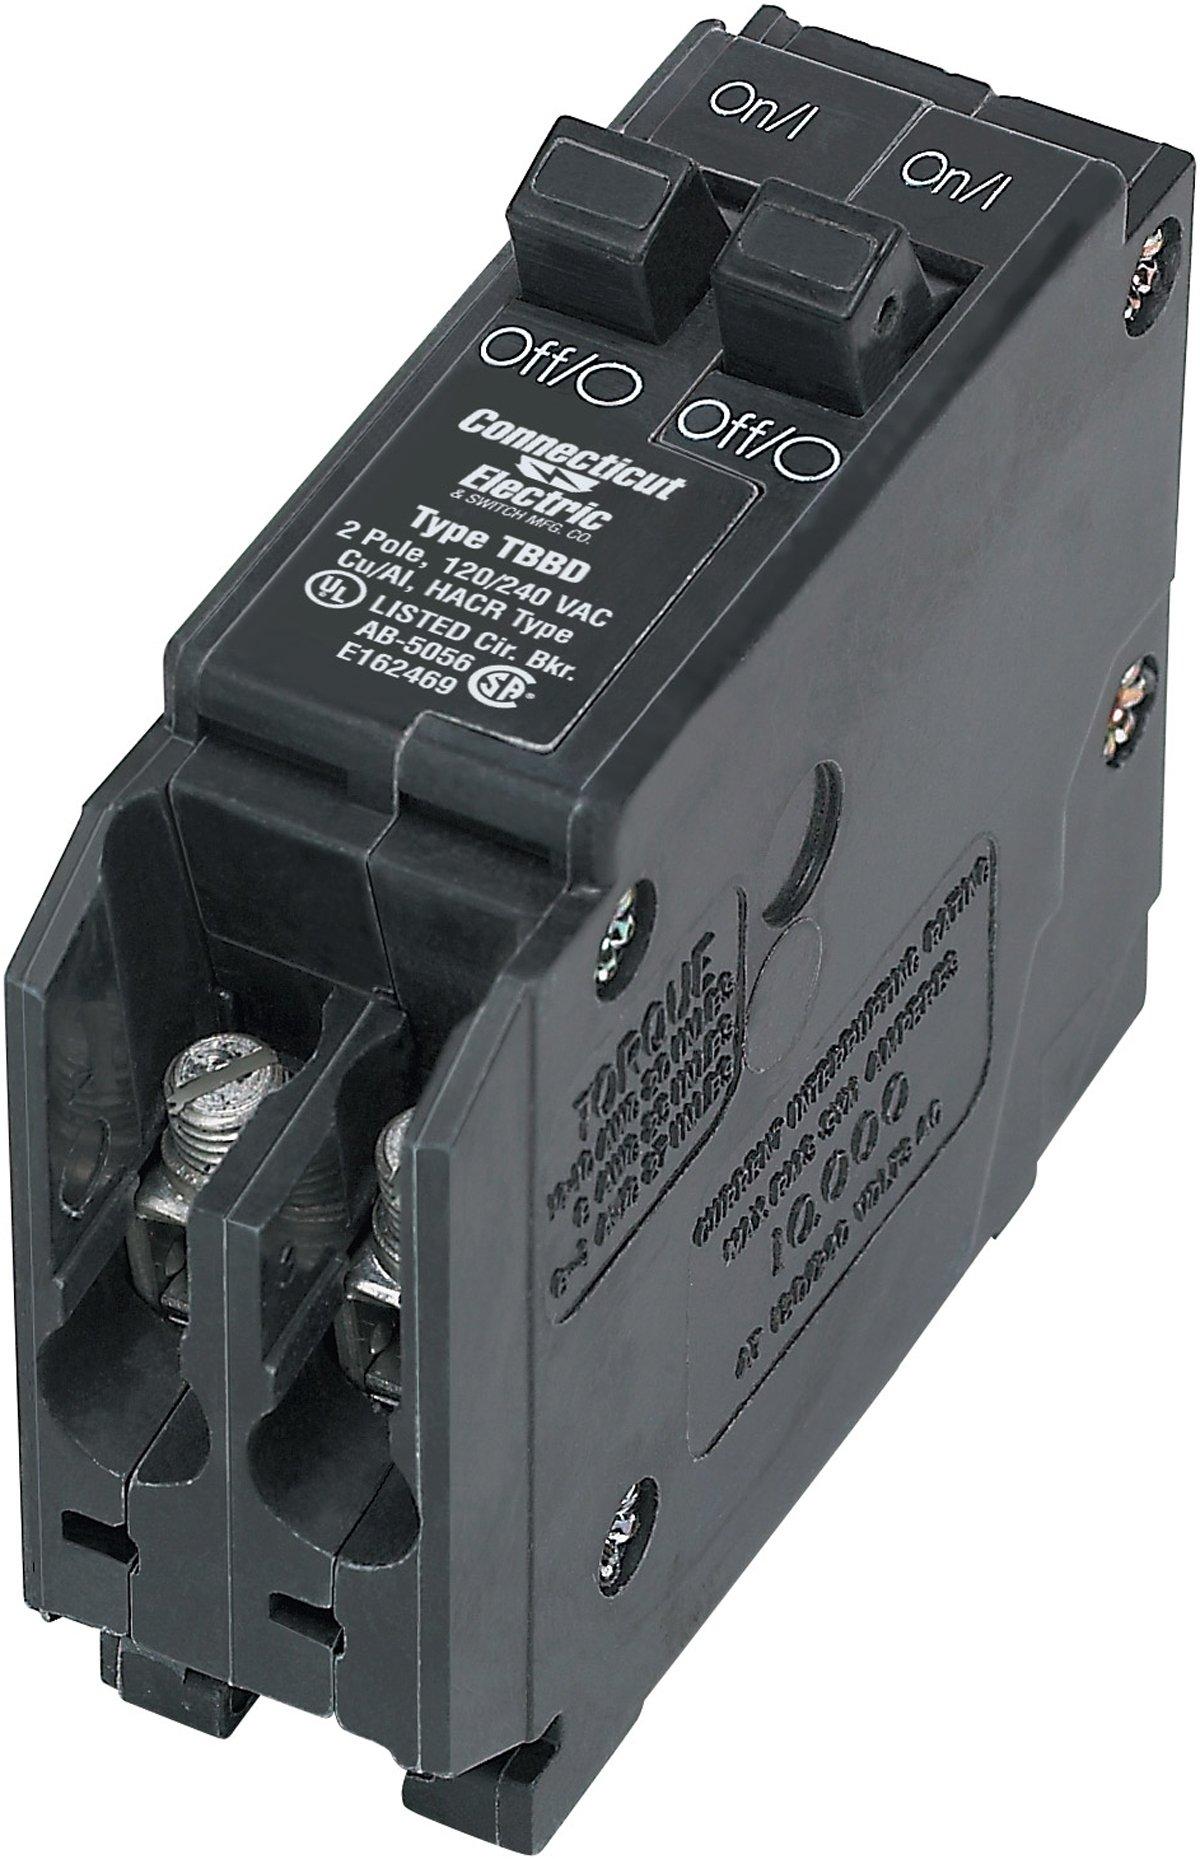 Parallax Power Supply UBI-TBBD3020 30/20 Amp Circuit Breaker